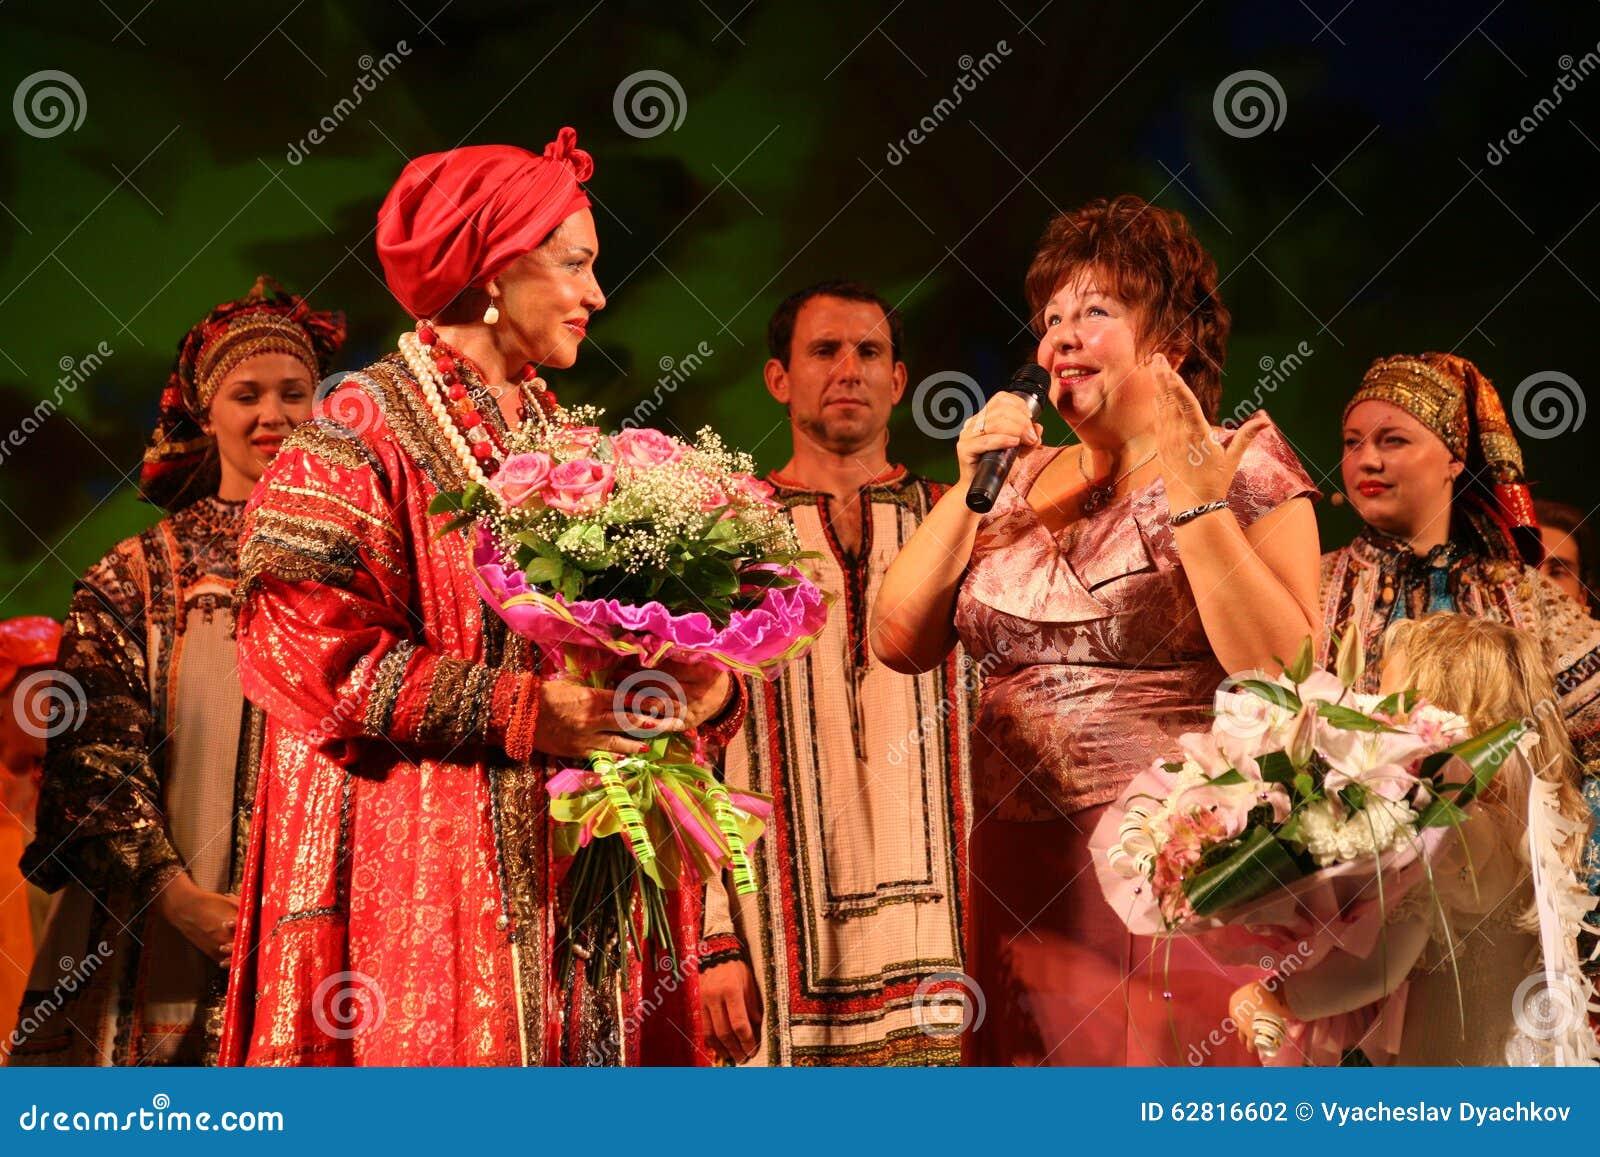 Nadezhda Babkina took part in a charity event 11.05.2011